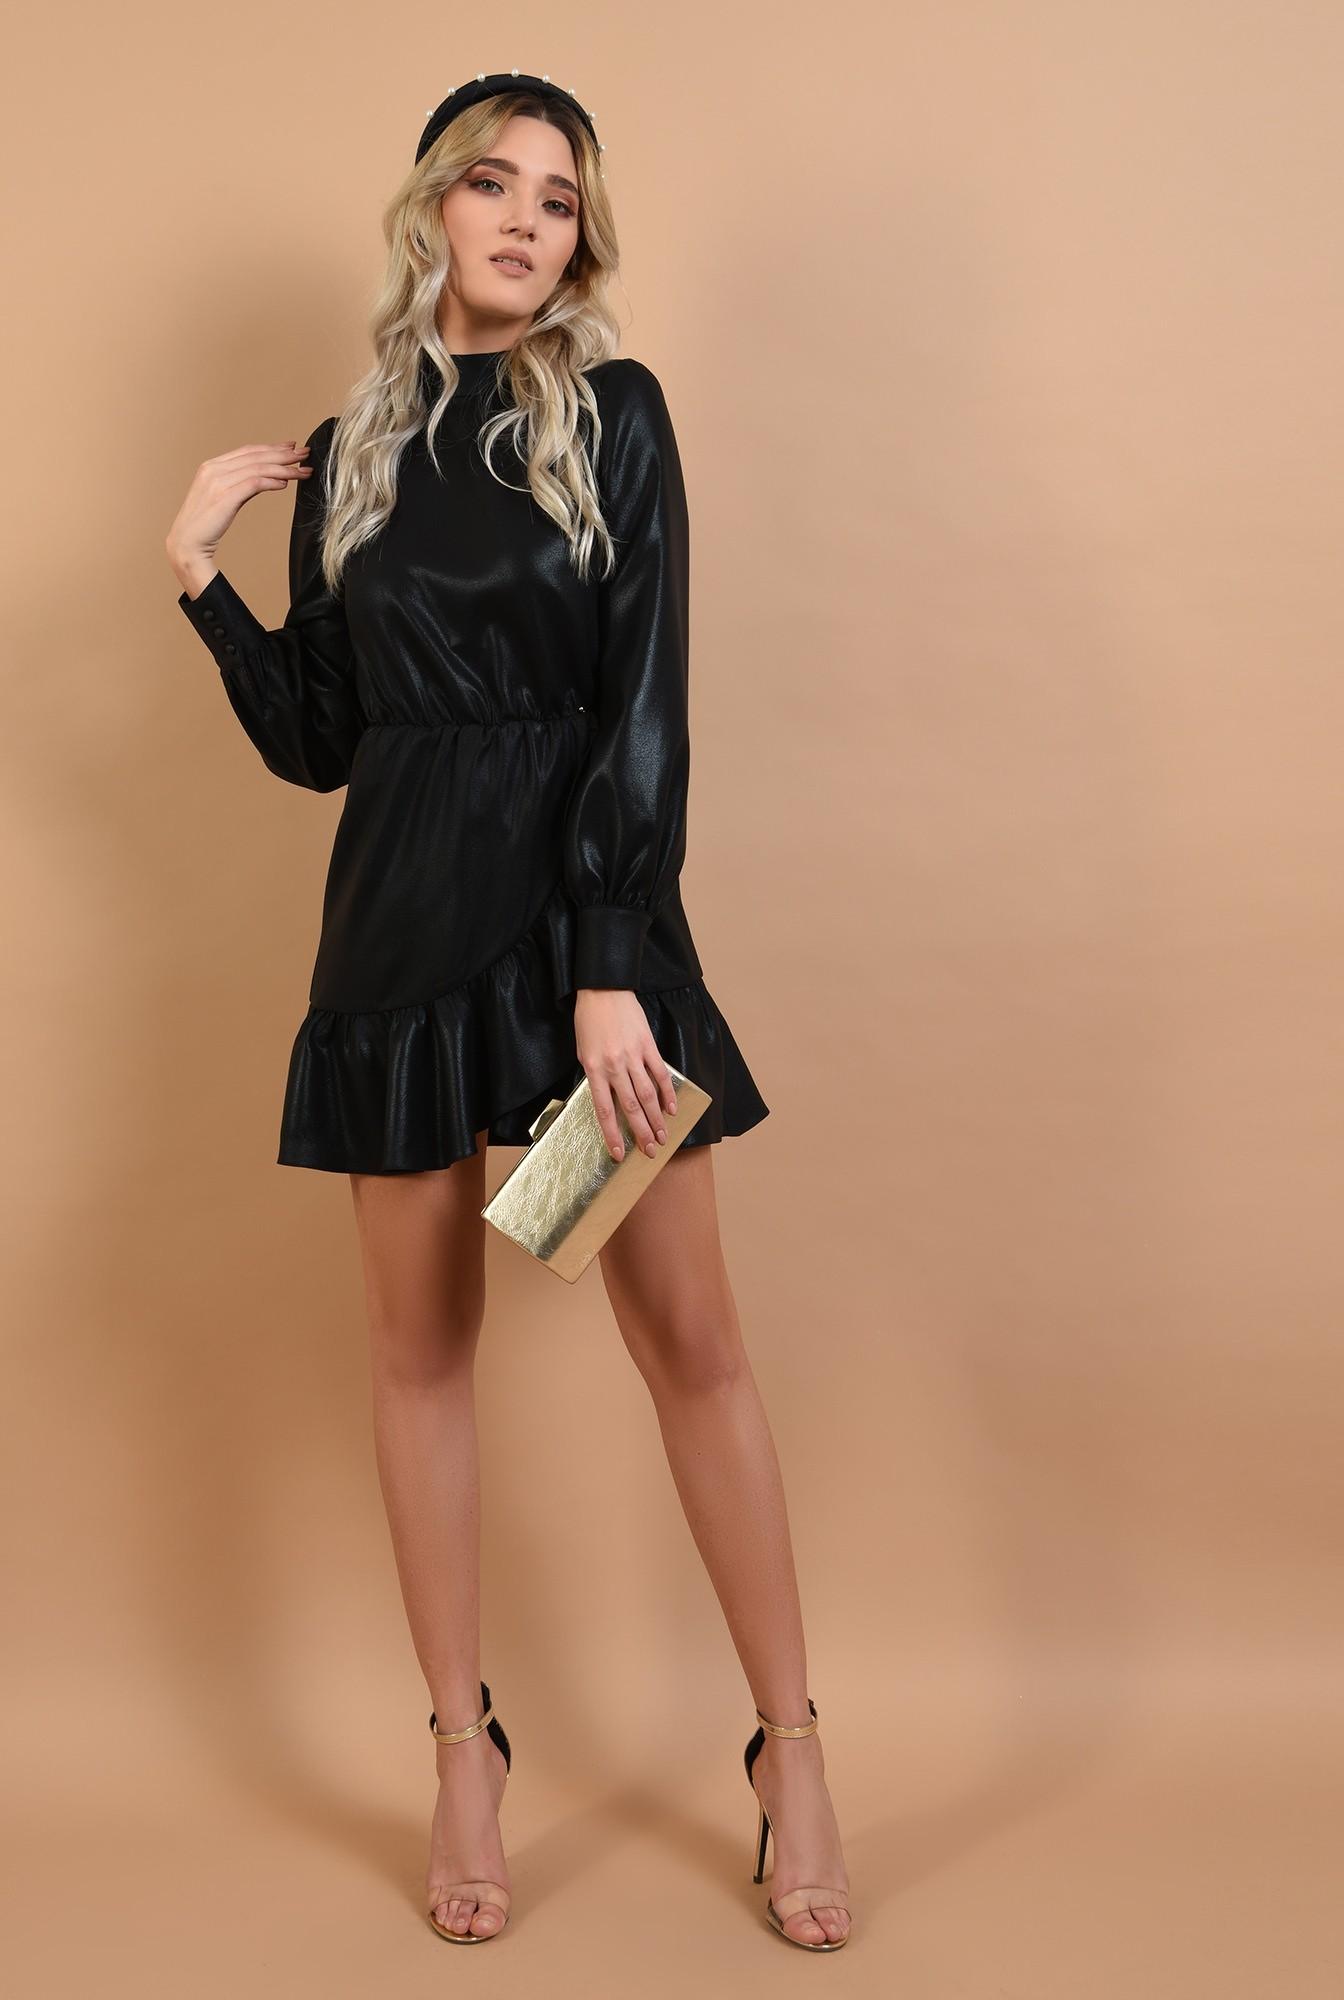 3 - 360 - rochie neagra, de ocazie, croi petrecut, nasturi la spate, Poema